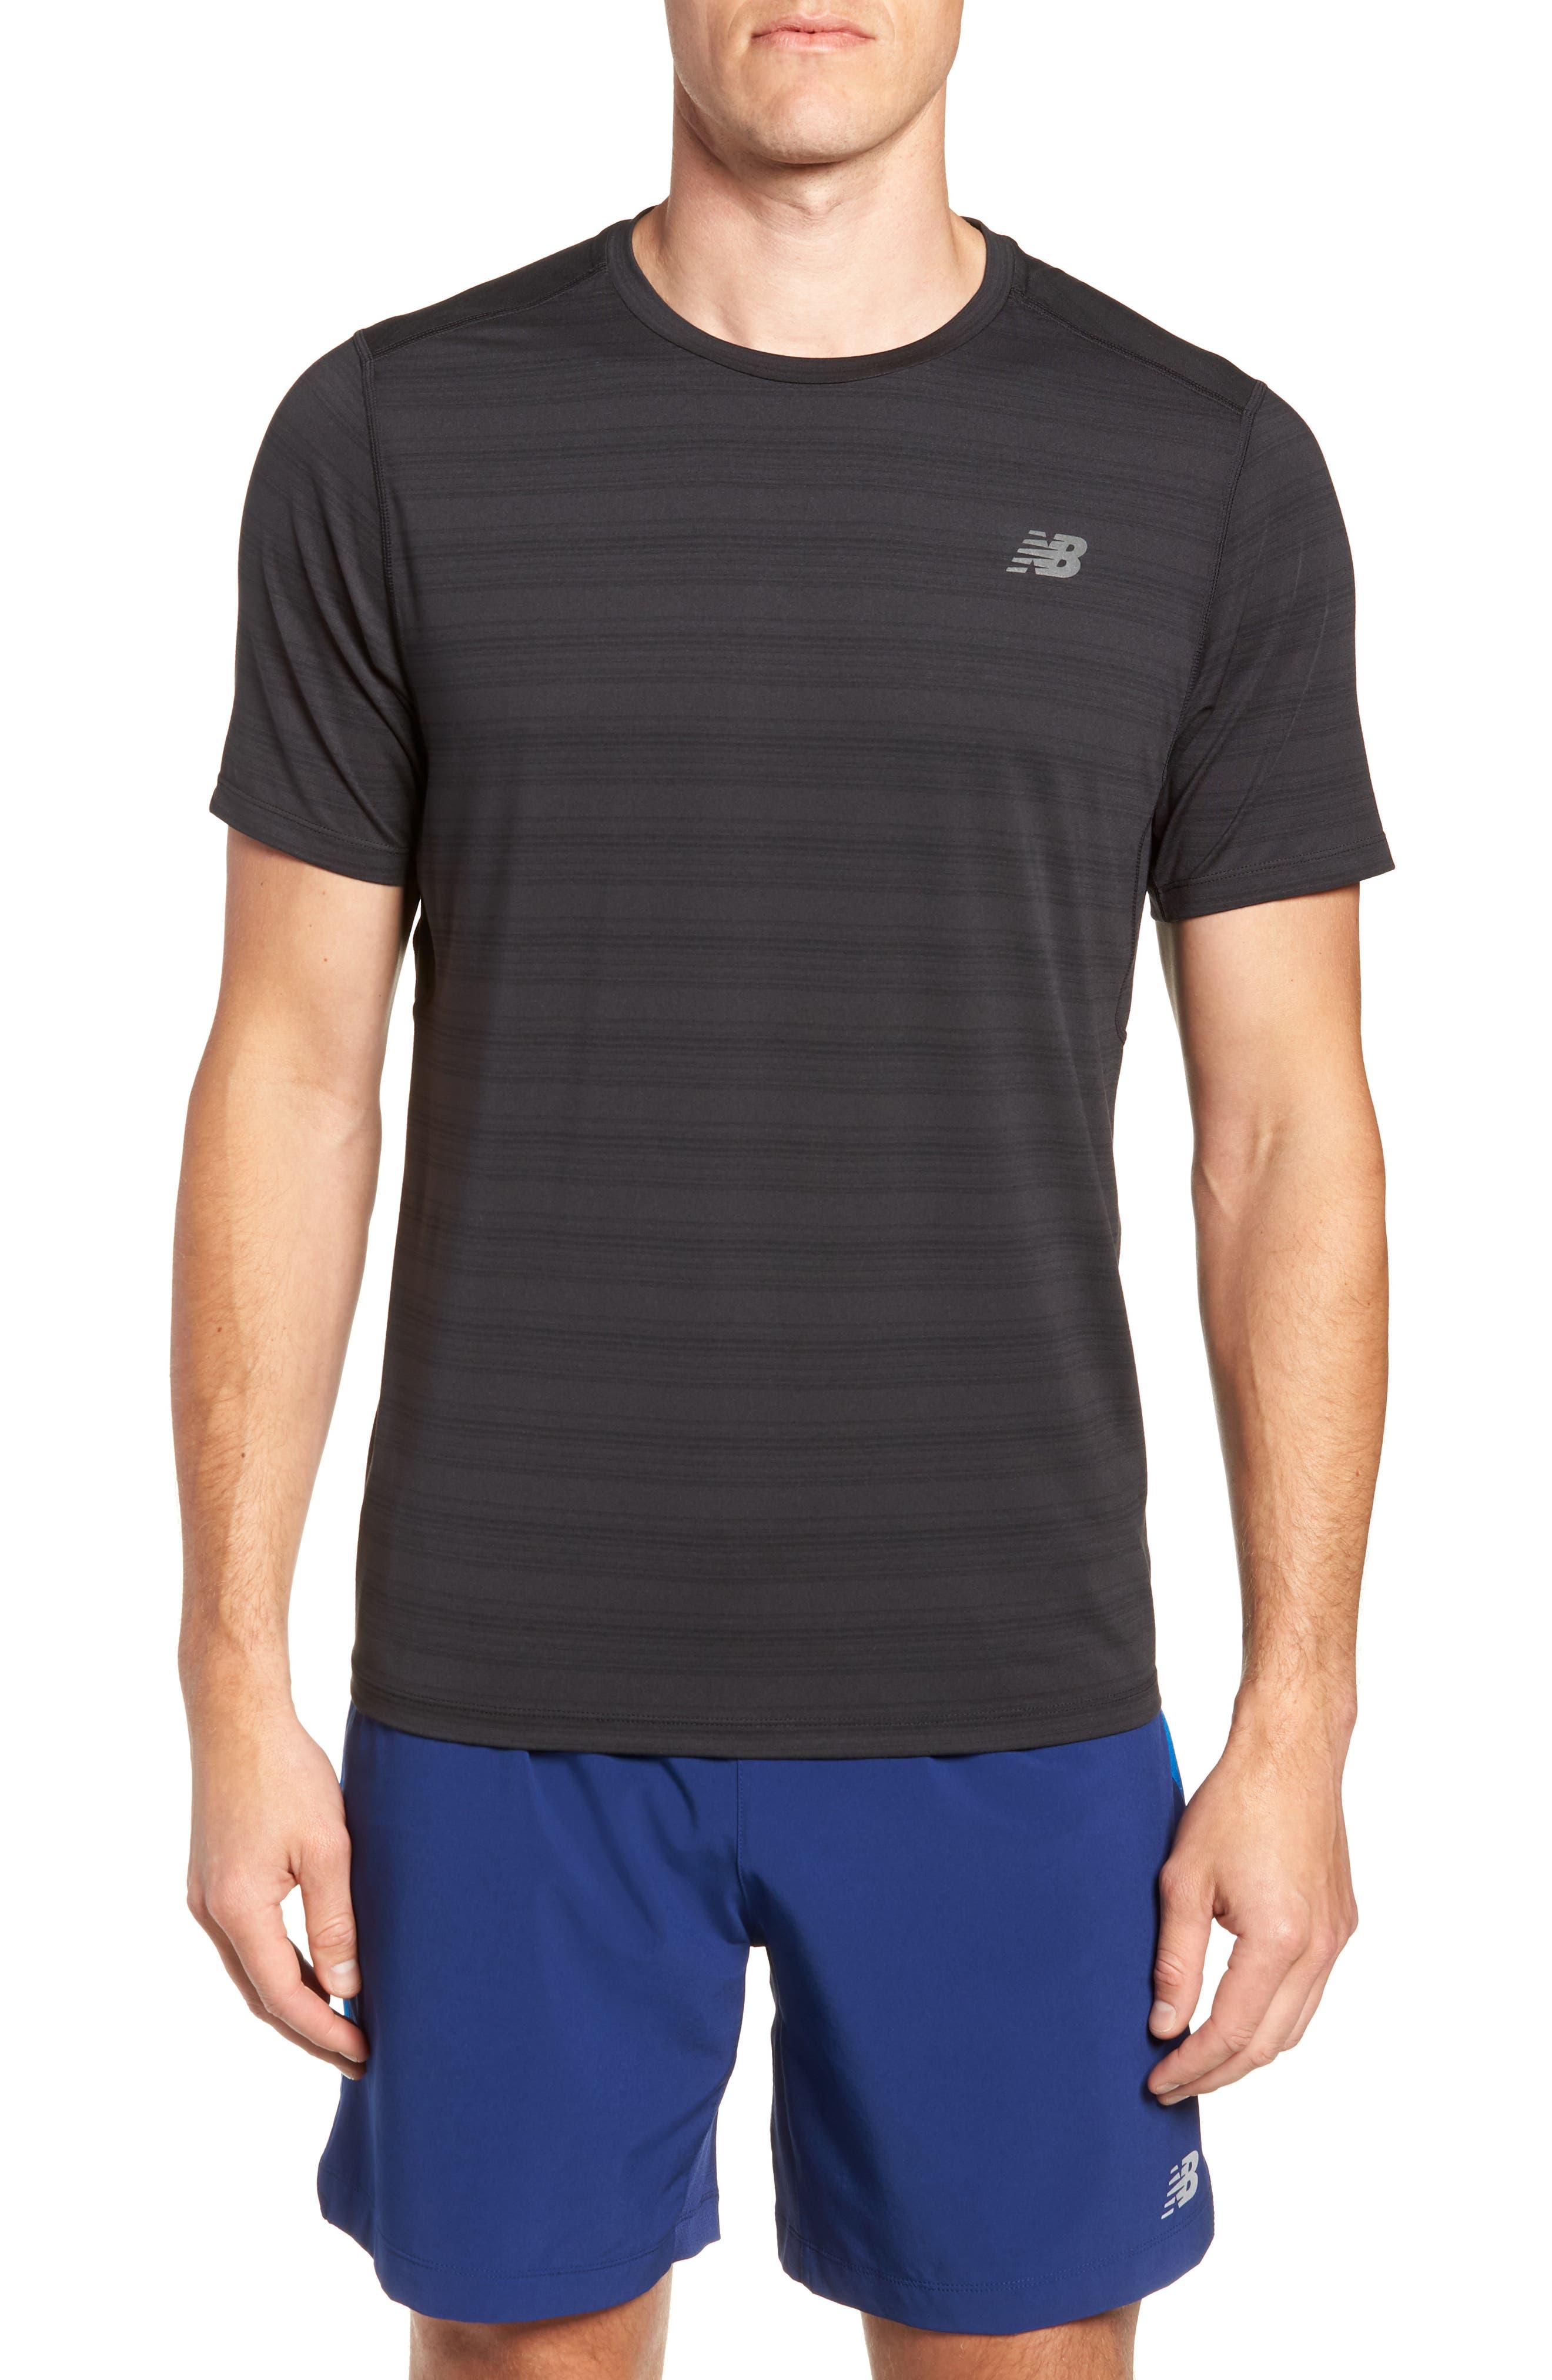 Anticipate Performance T-Shirt,                             Main thumbnail 1, color,                             BLACK